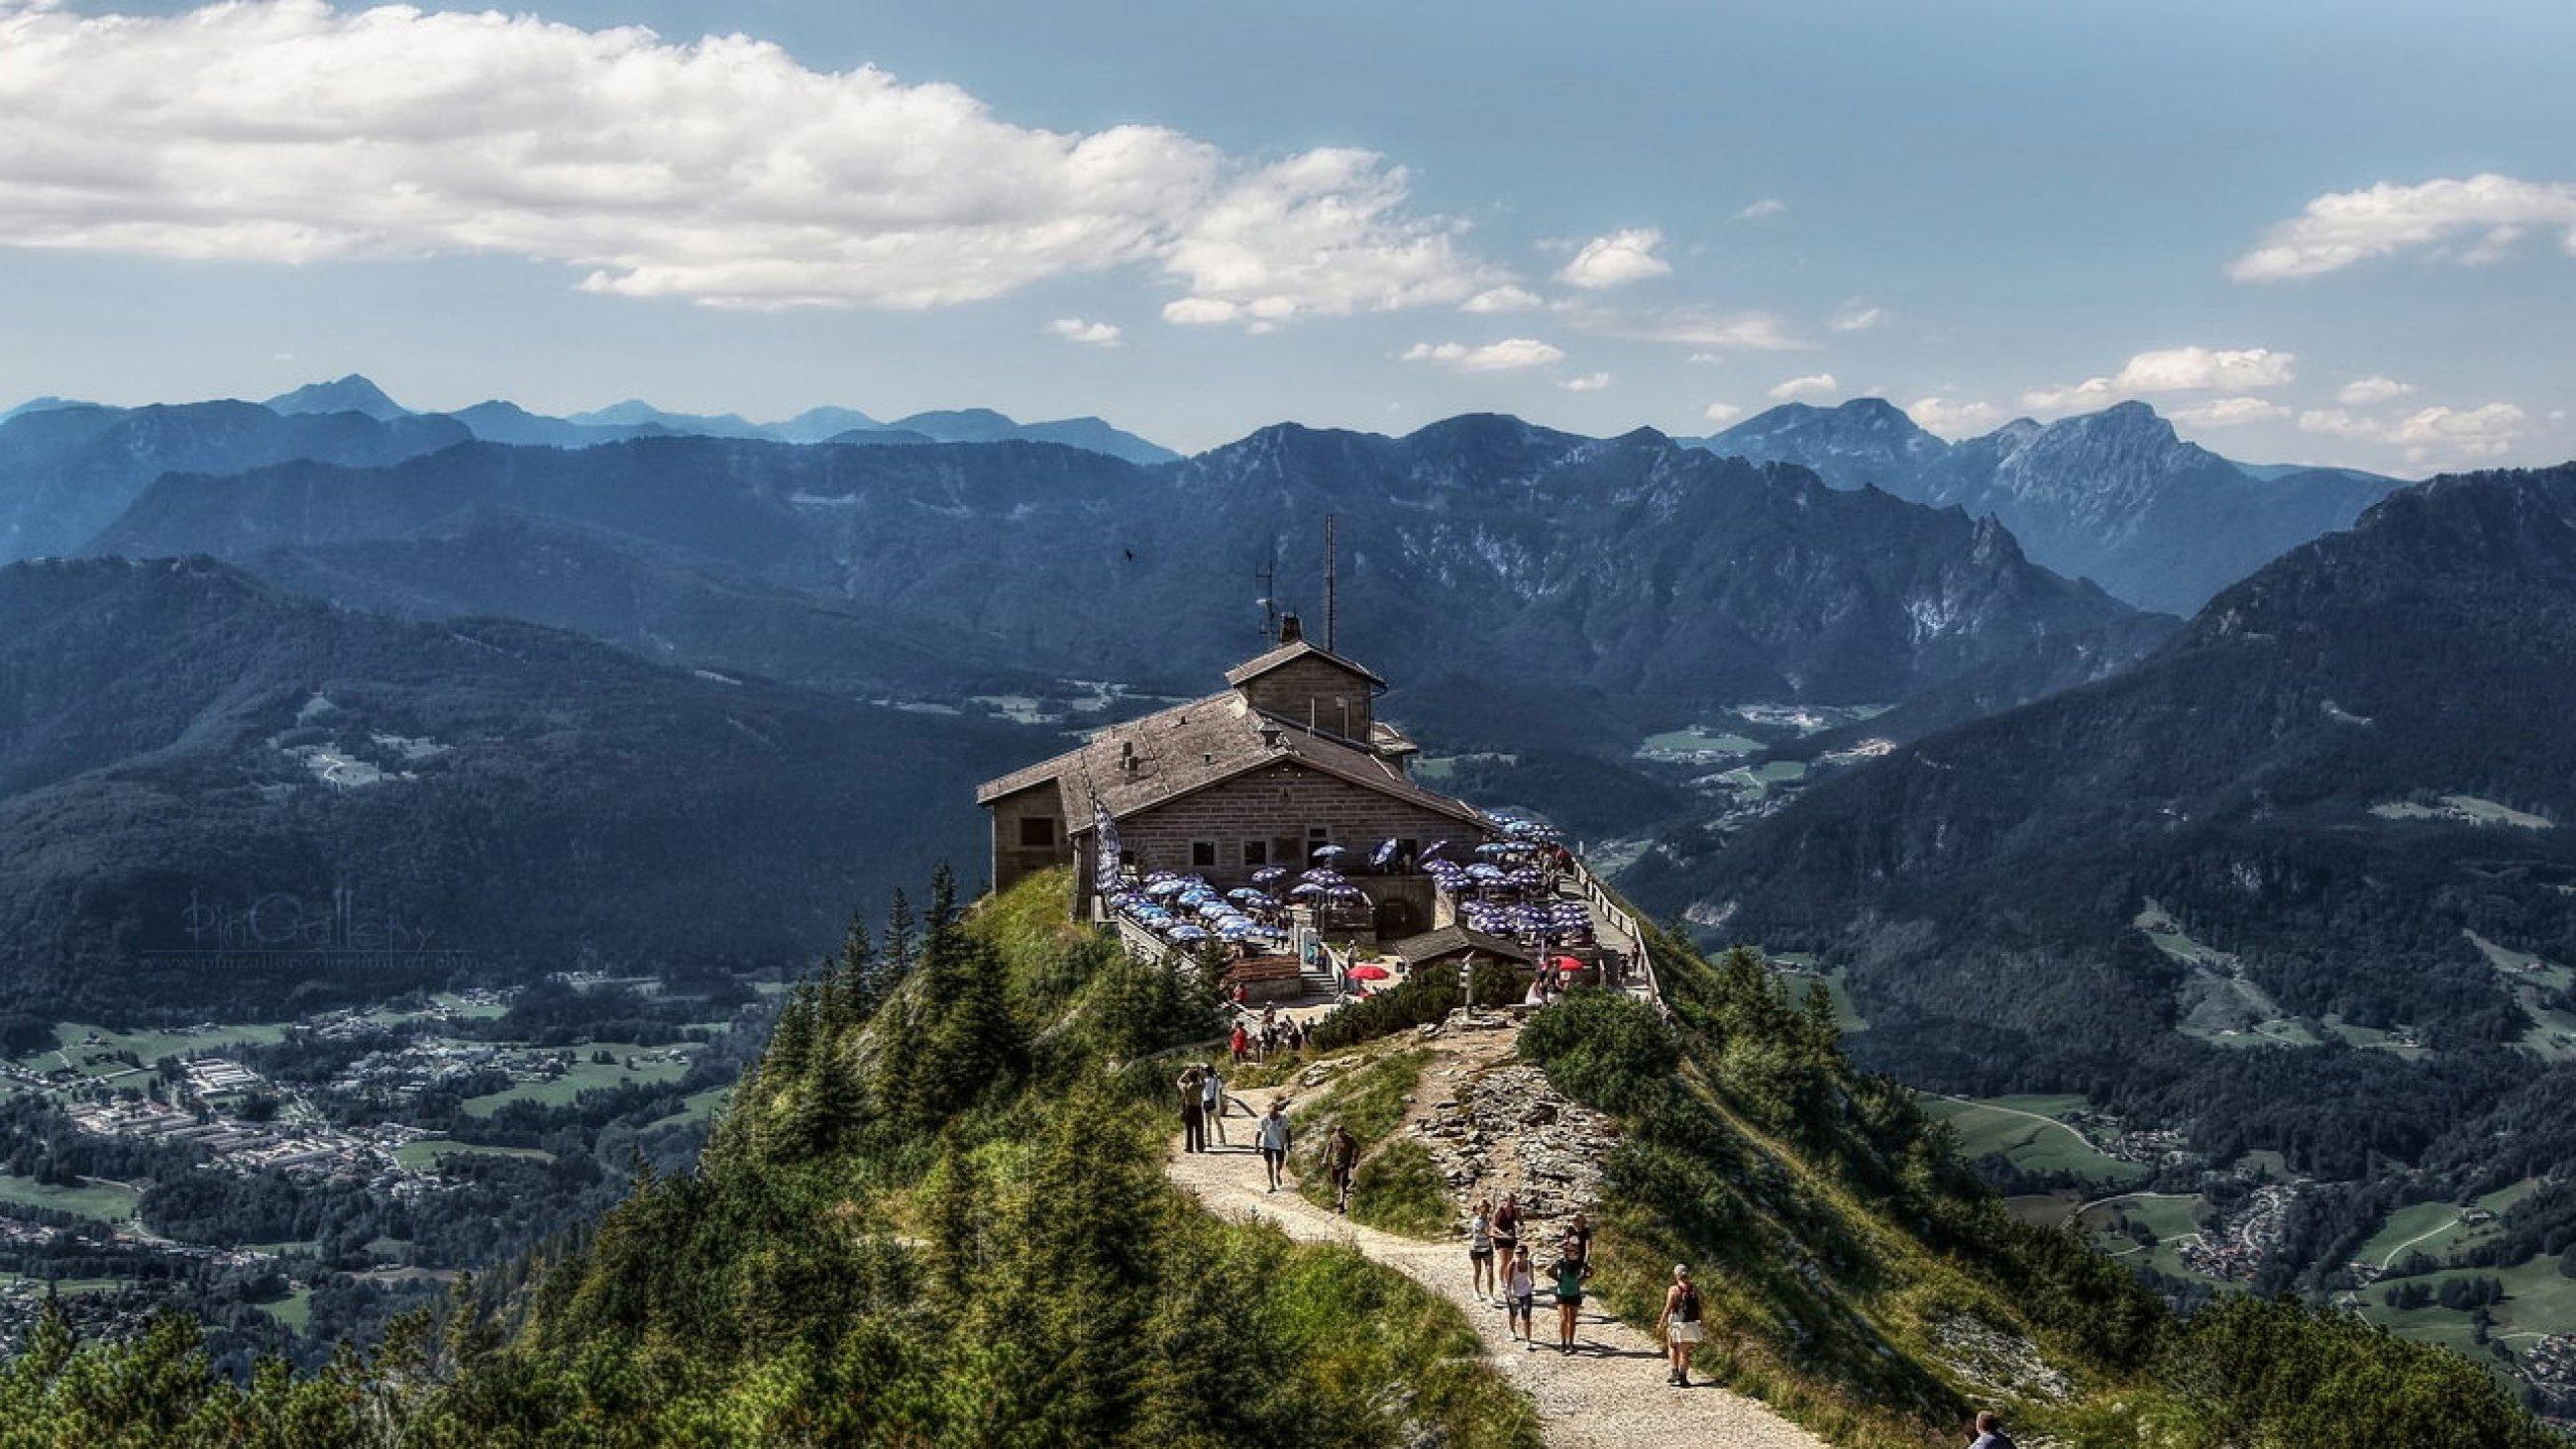 https://bubo.sk/uploads/galleries/7441/berchtesgaden.jpg